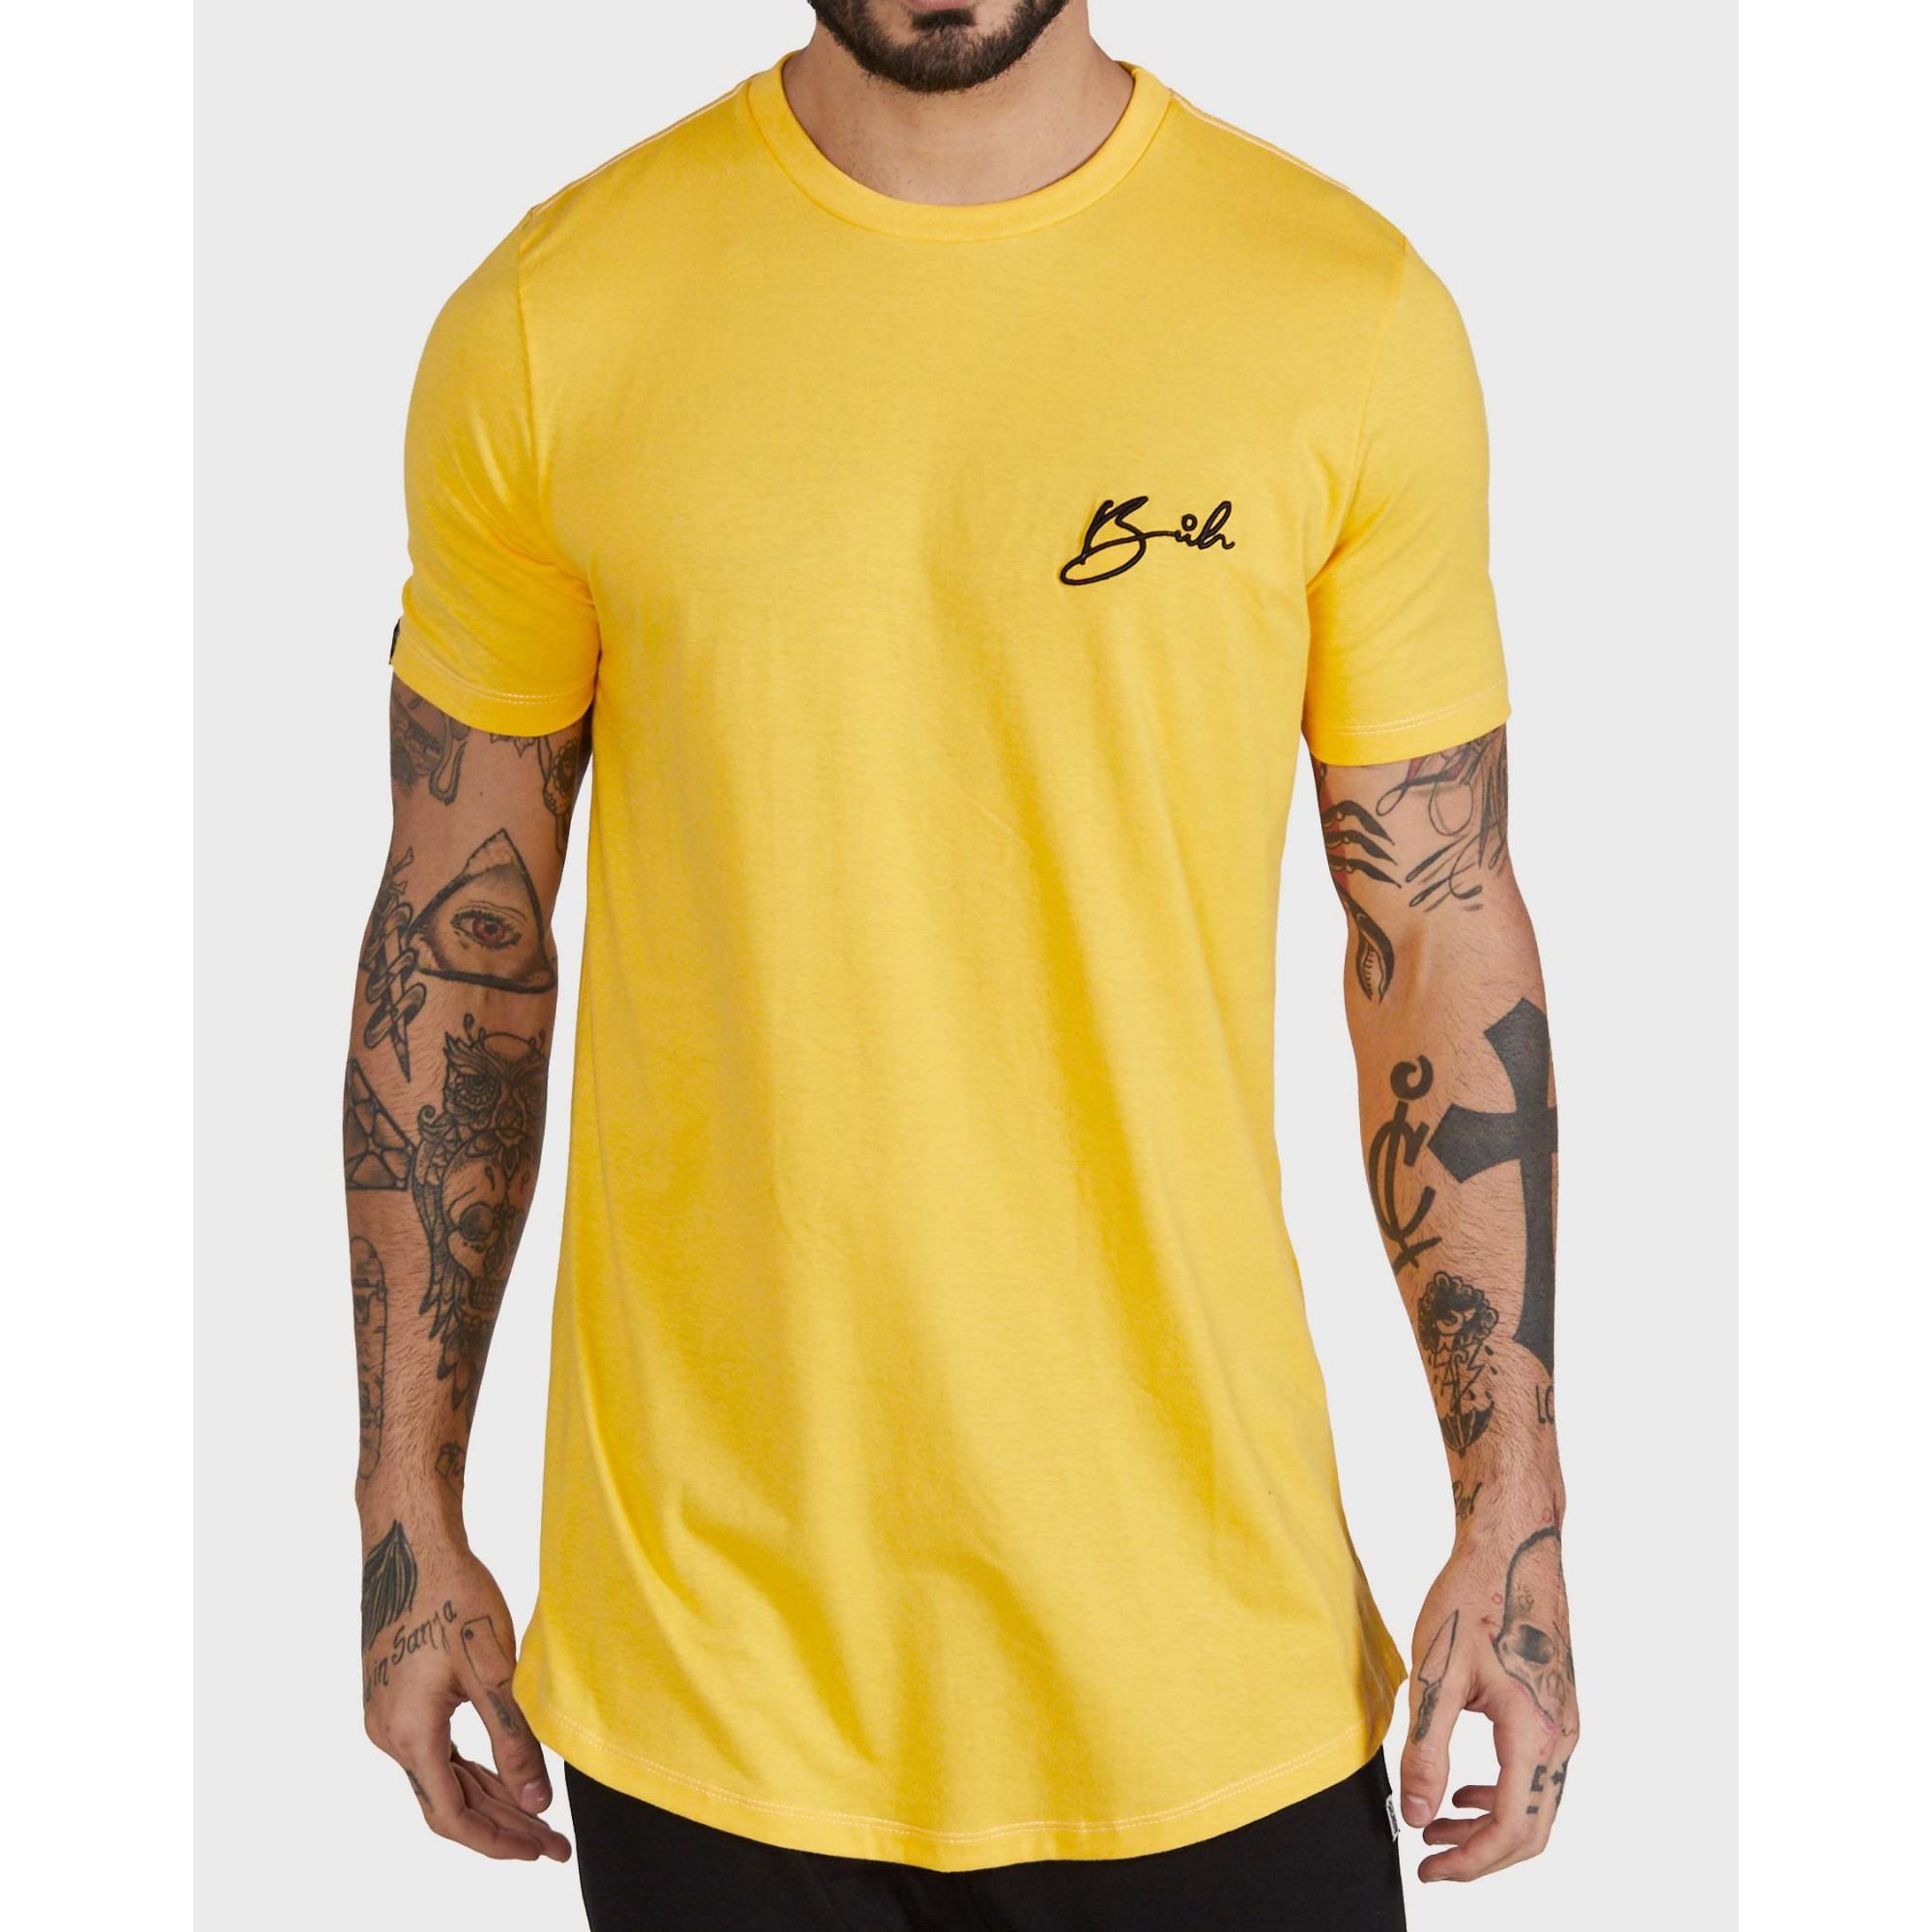 Camiseta Buh Bordado Yellow